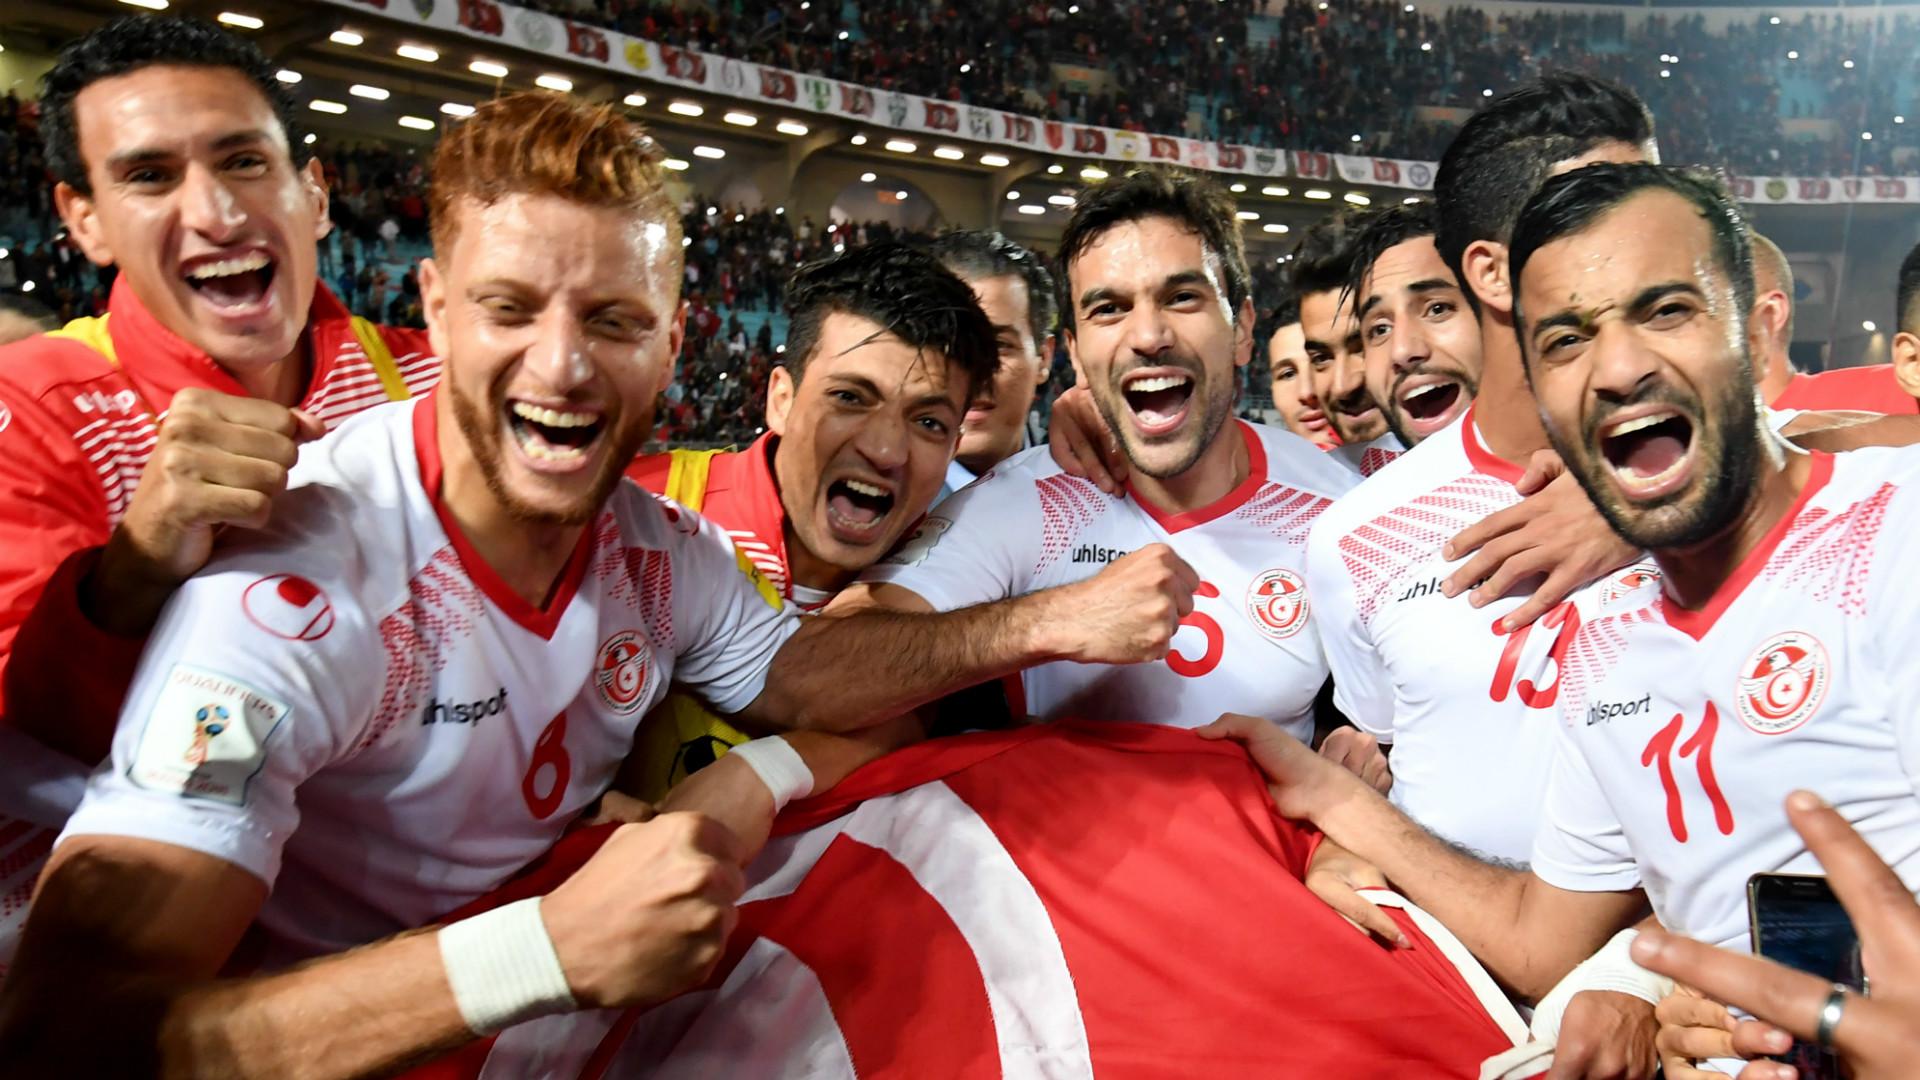 Tunisia-world-cup_1mkcyzb3sei7n14kw0ze9r3qa2